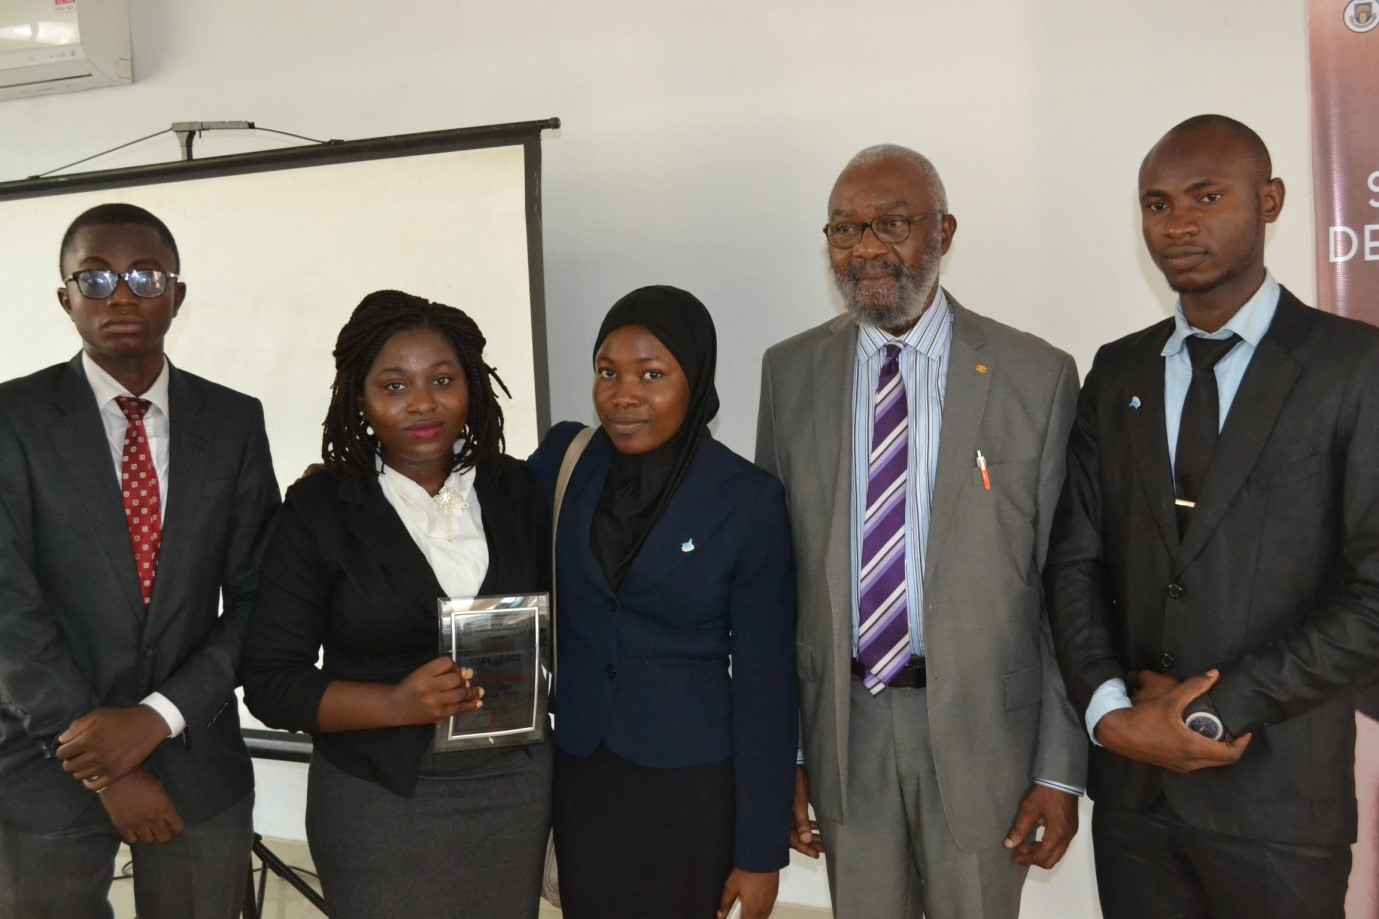 2017 WINNERS: Kazeem Folarin (also won 'Best Chief Speaker' award), Temiwunmi Akinmuleya, Khadeejah Babalola and Aliu Raji in a group photograph with the patron, Sir Ifeanyi Atueyi